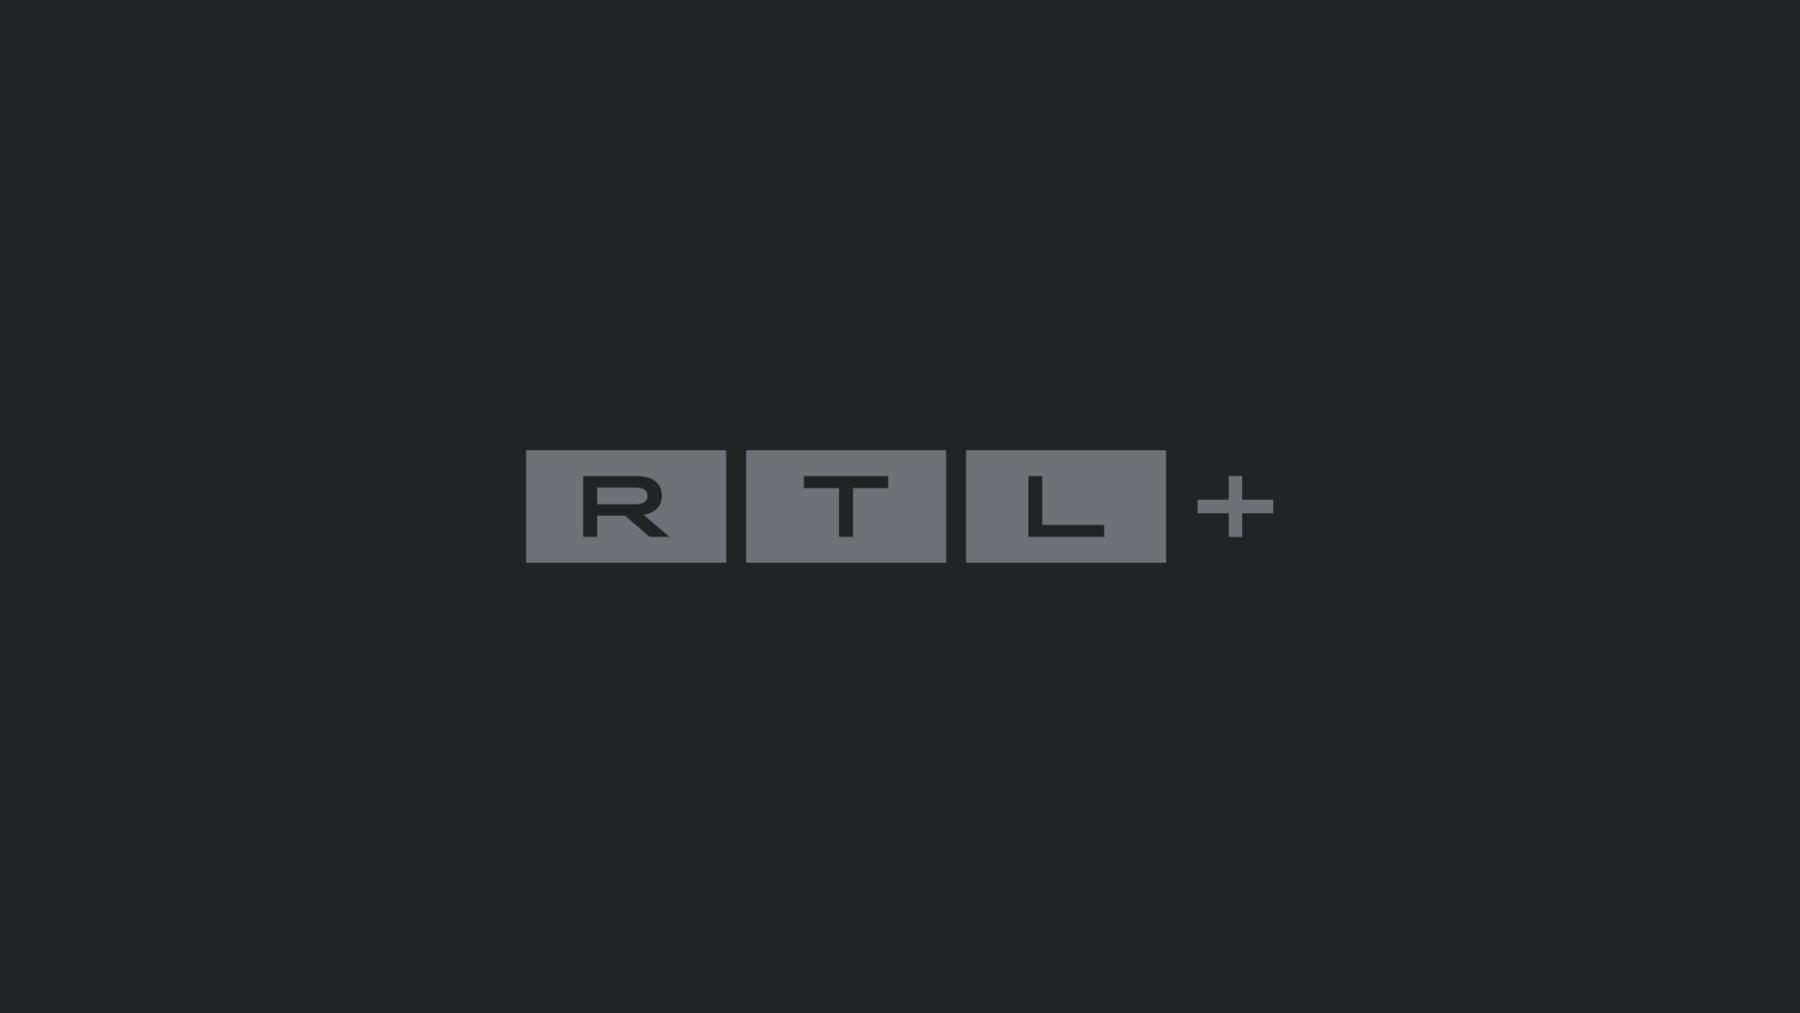 Trailer: 08/17 - mit Chris Tall und Özcan Cosar